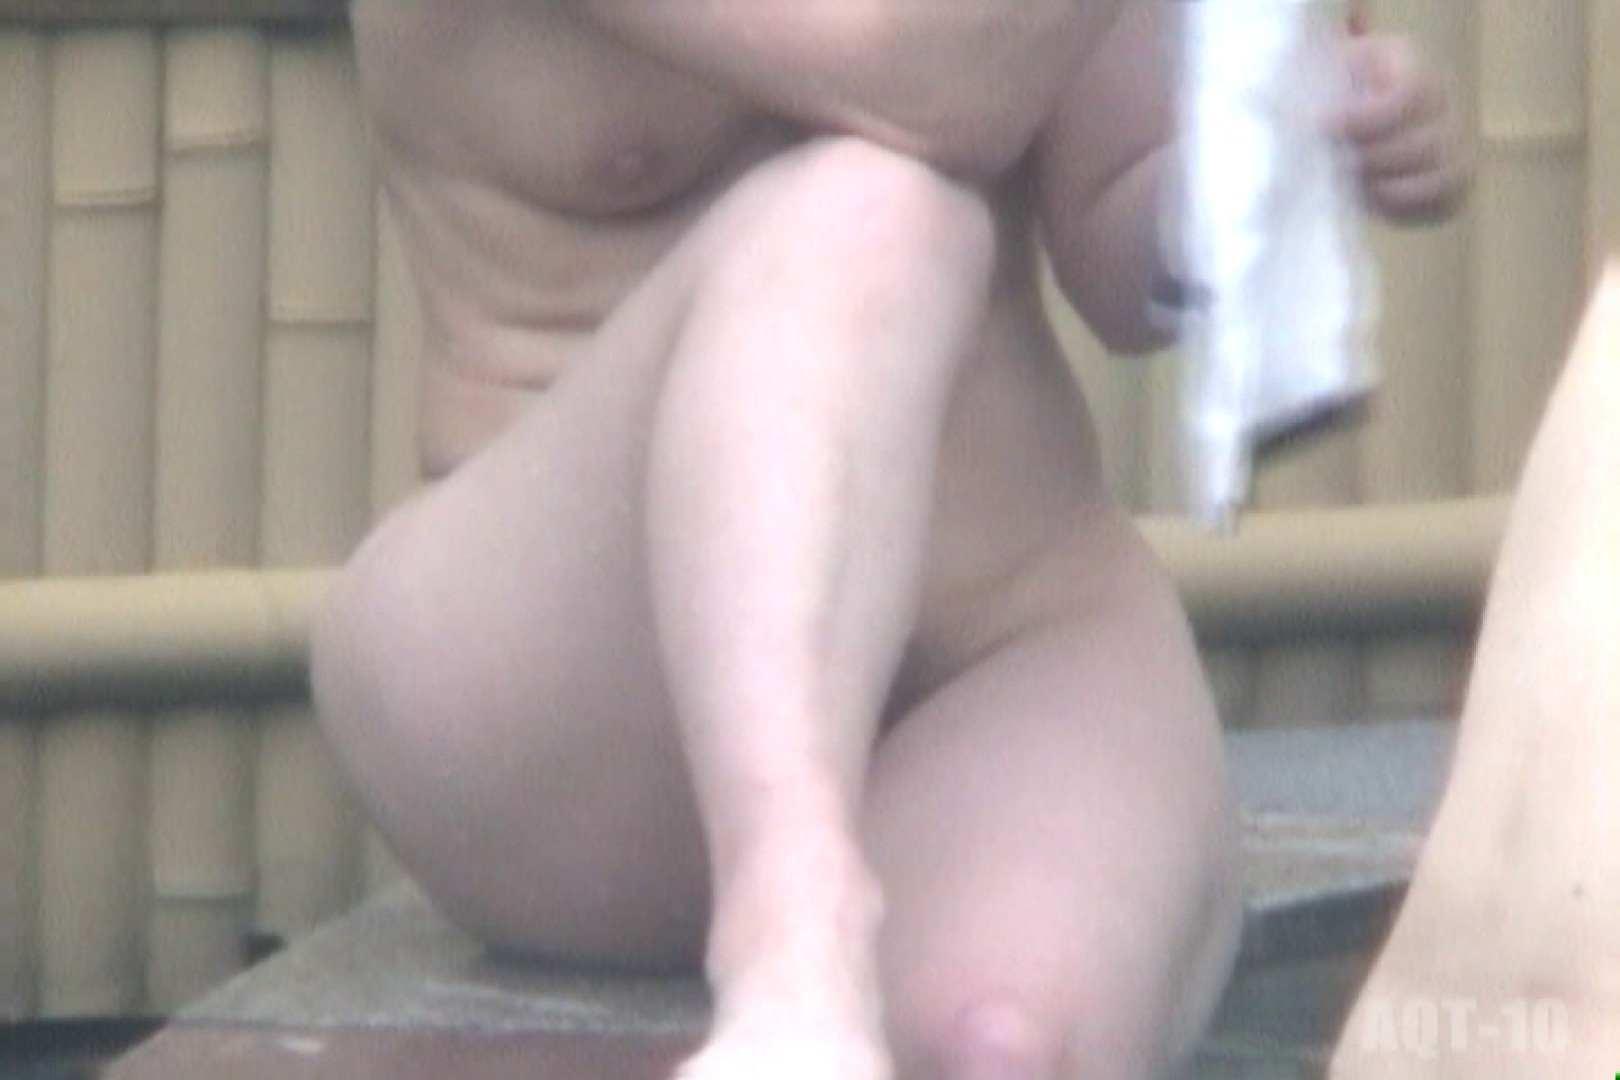 Aquaな露天風呂Vol.795 露天風呂突入 | 美しいOLの裸体  103pic 94